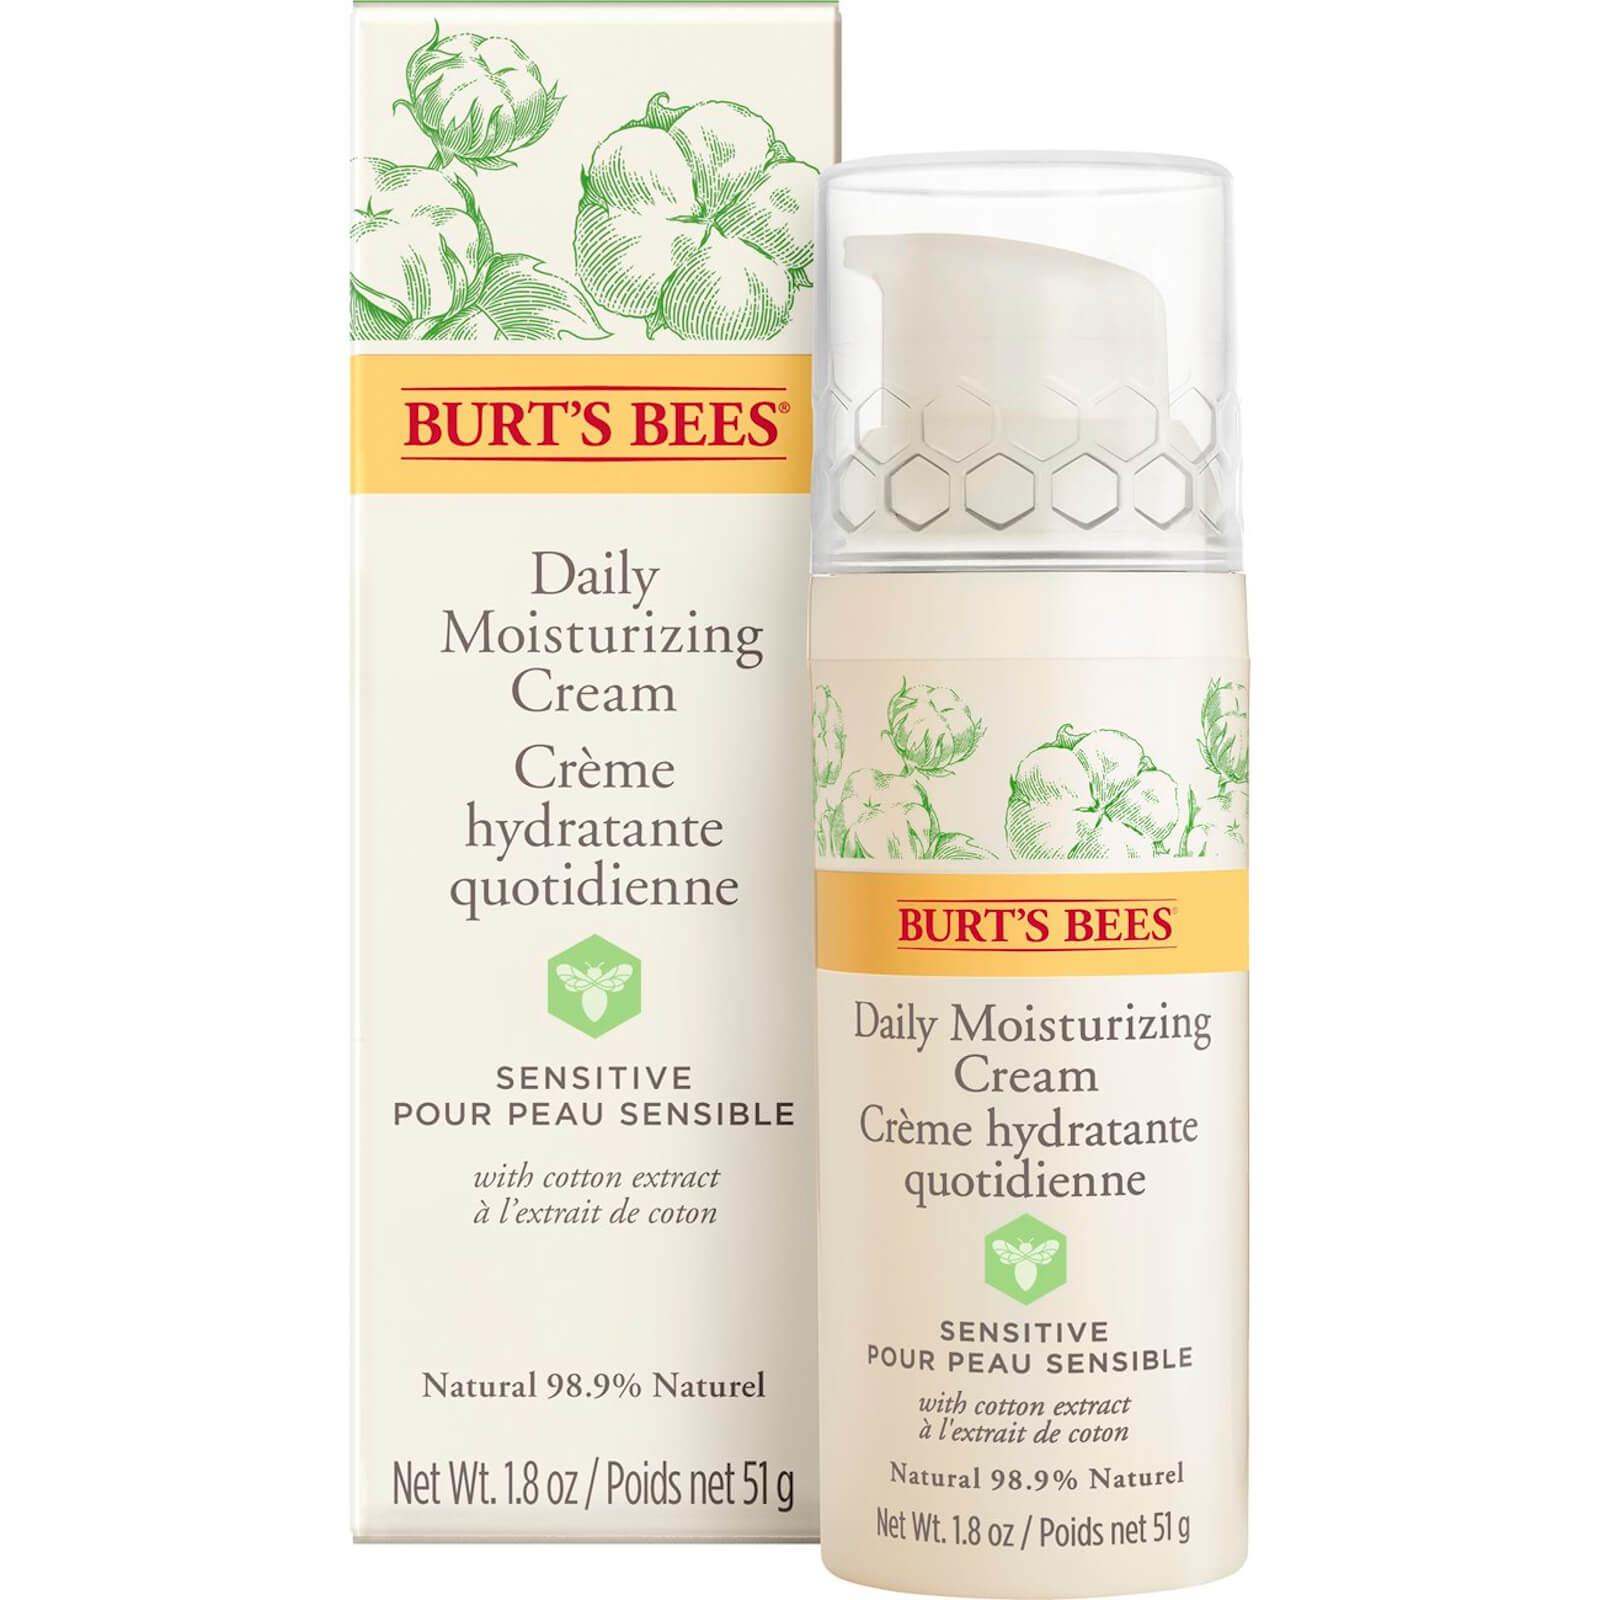 Burts Bees Sensitive Daily Moisturising Cream 50g